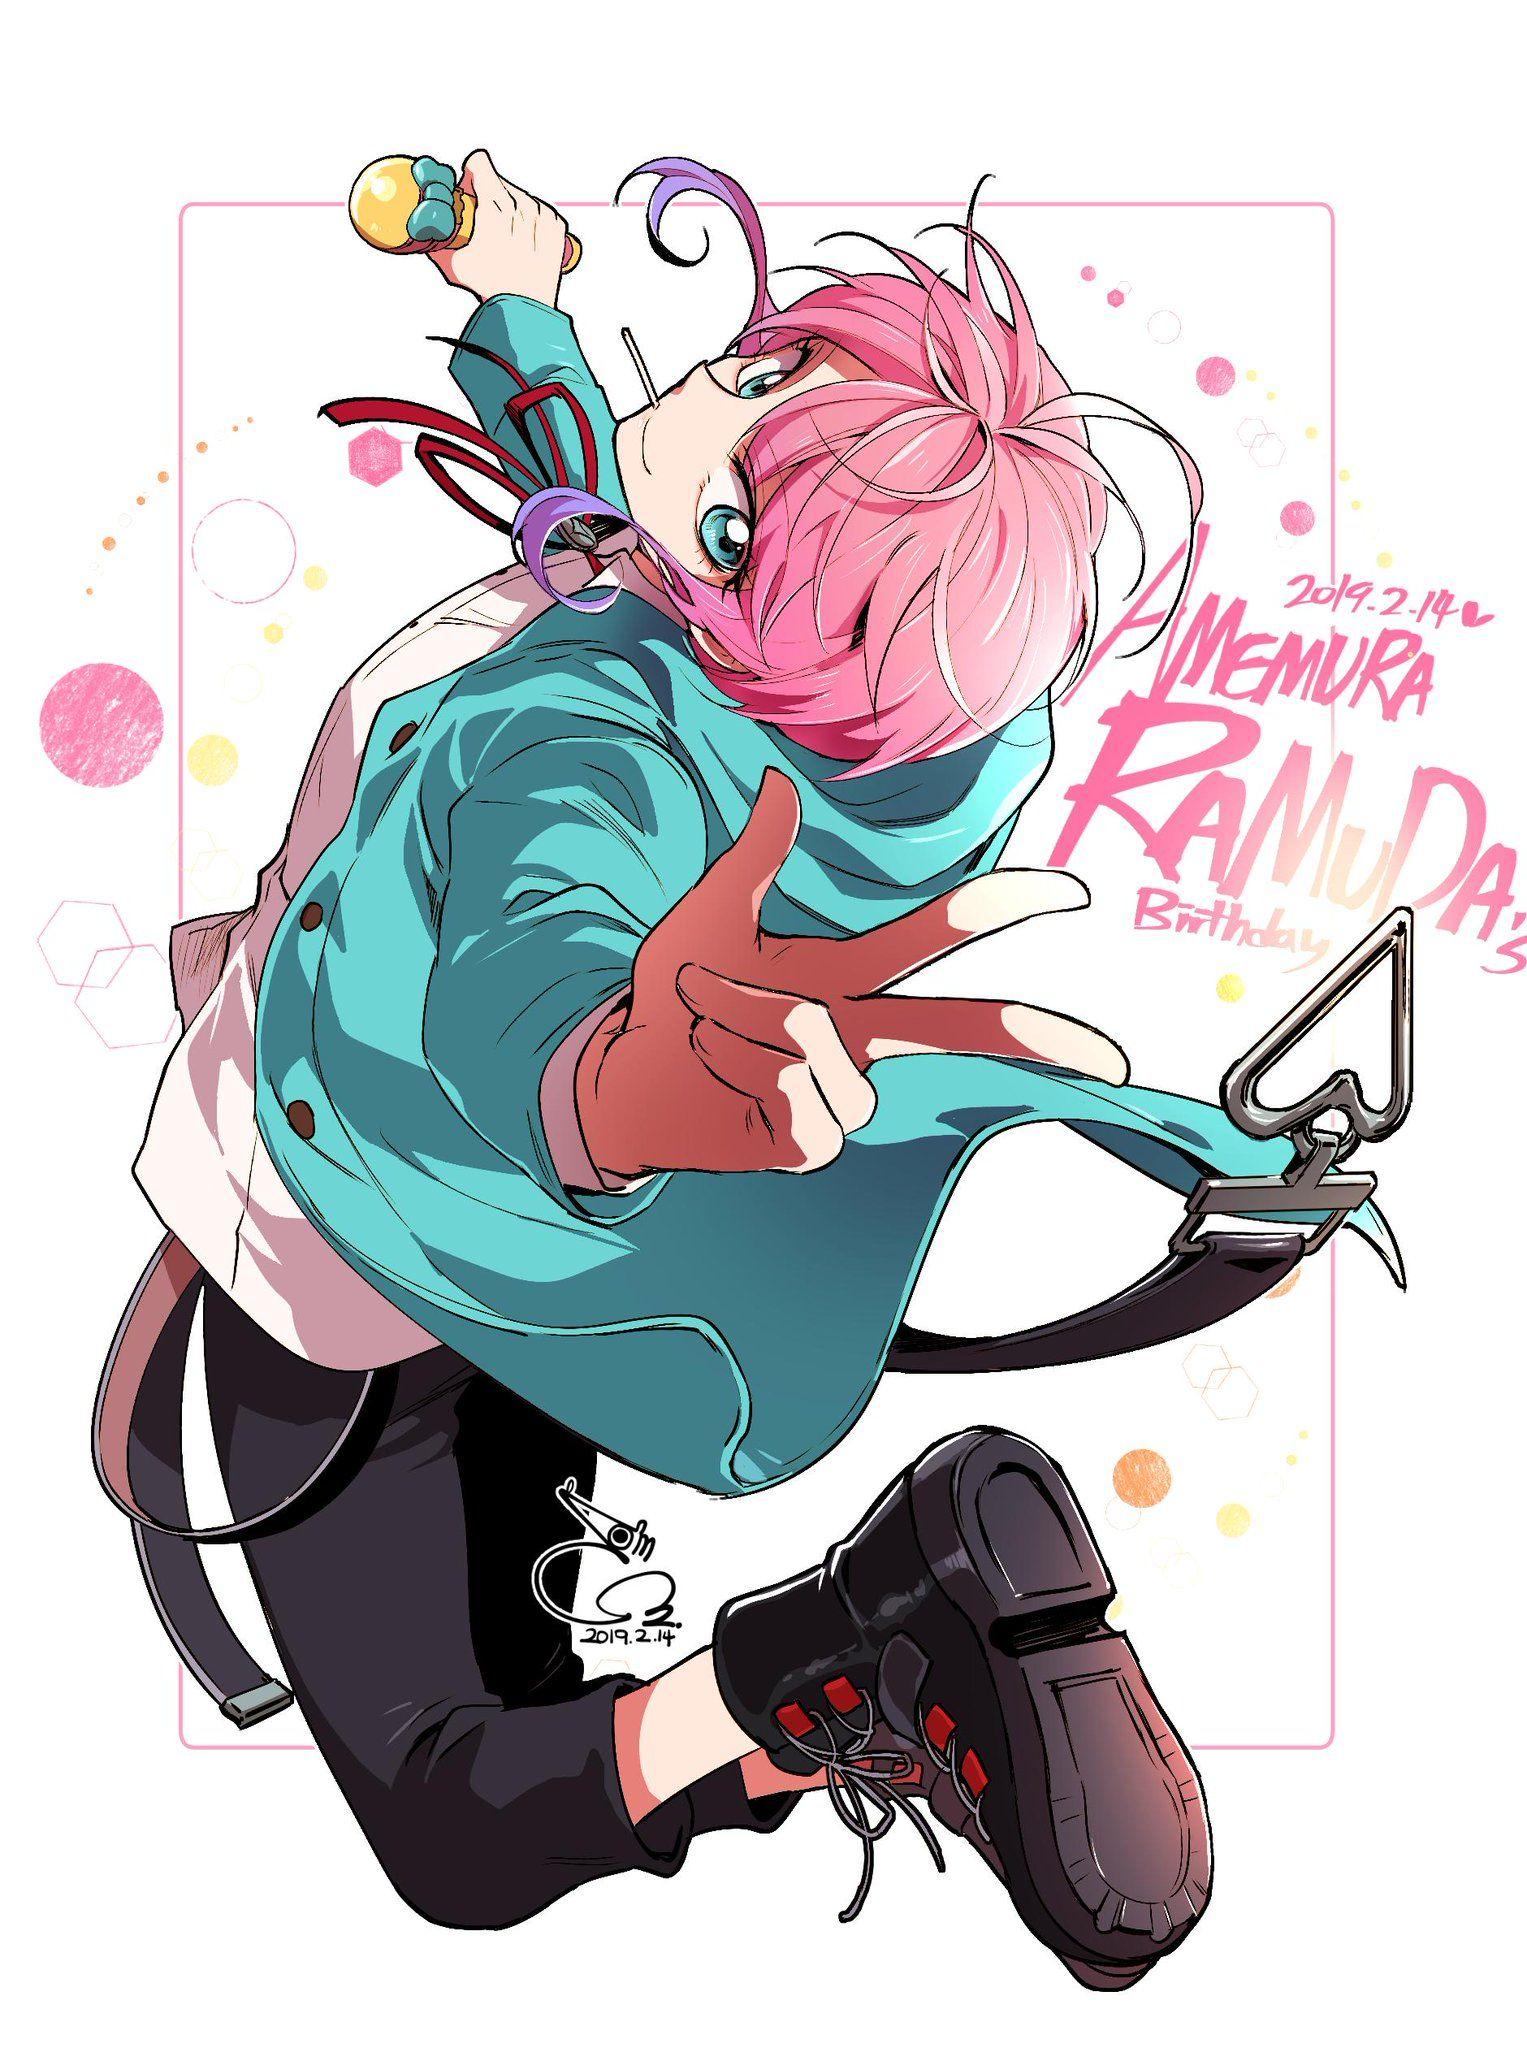 Pin by joud on amemura ramuda anime boy anime rap battle